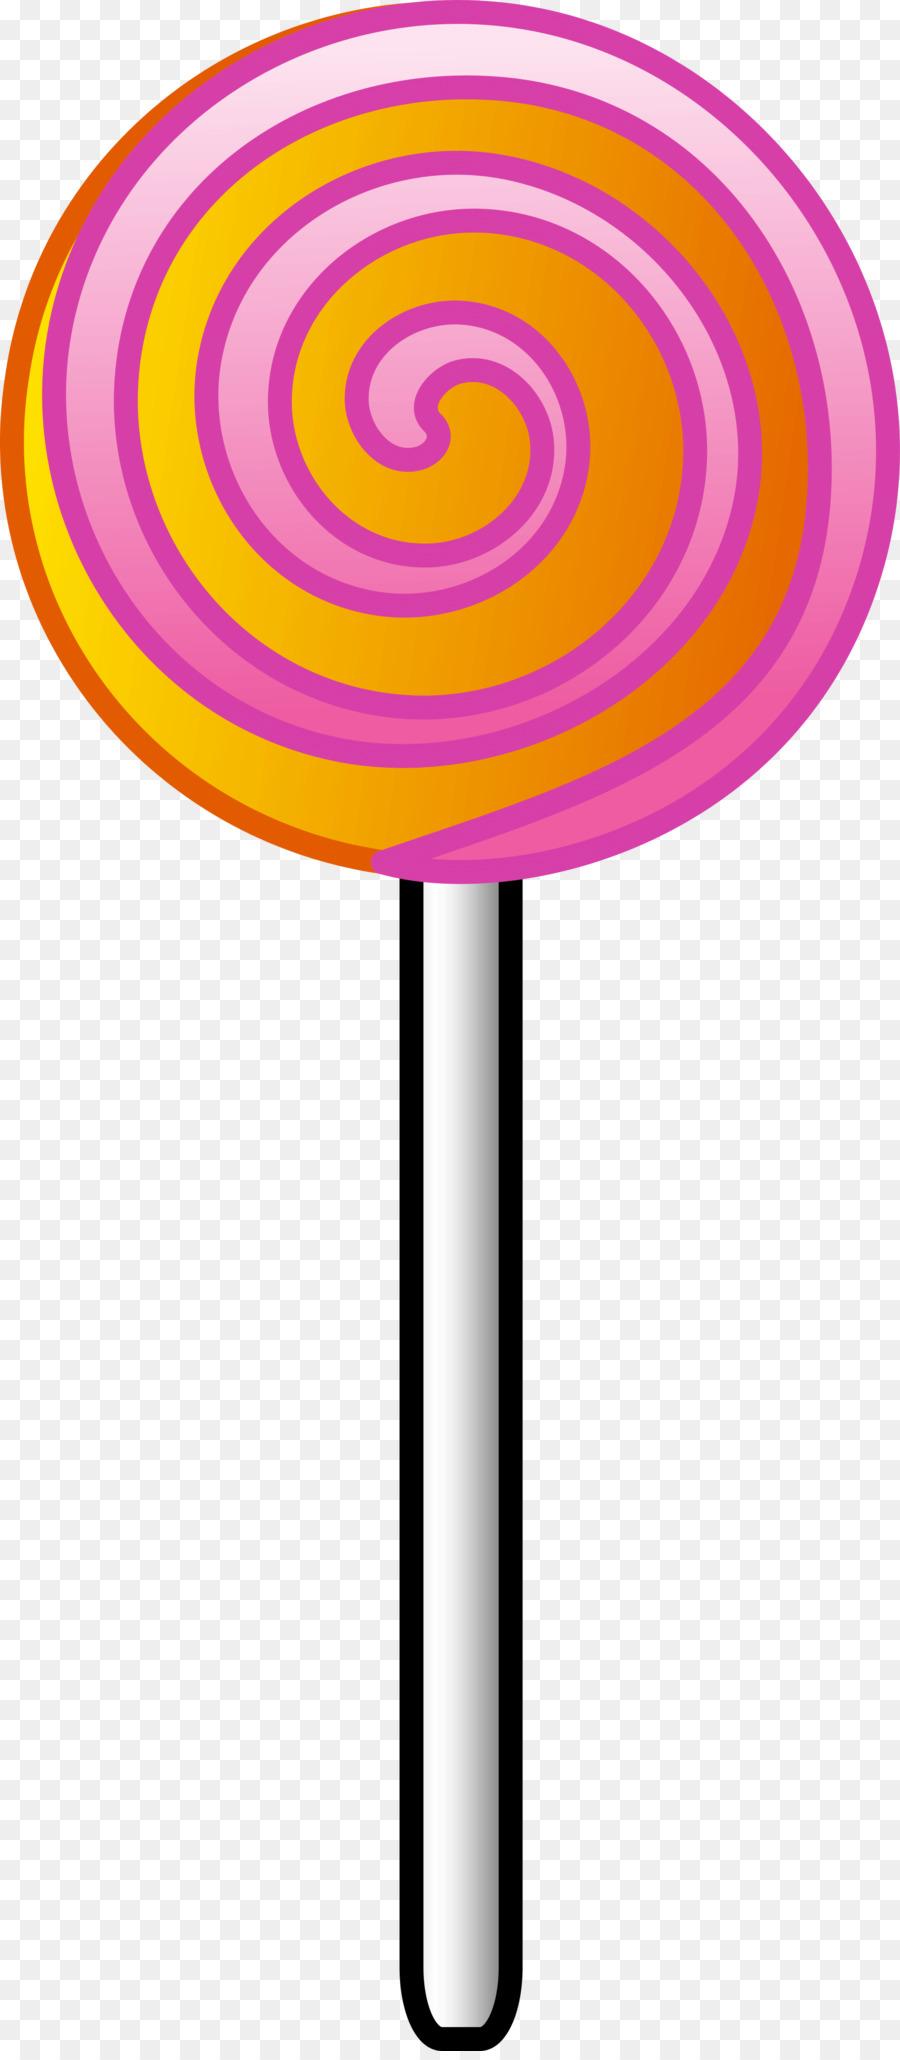 Lollipop candy cane clip. 5 clipart lollypop